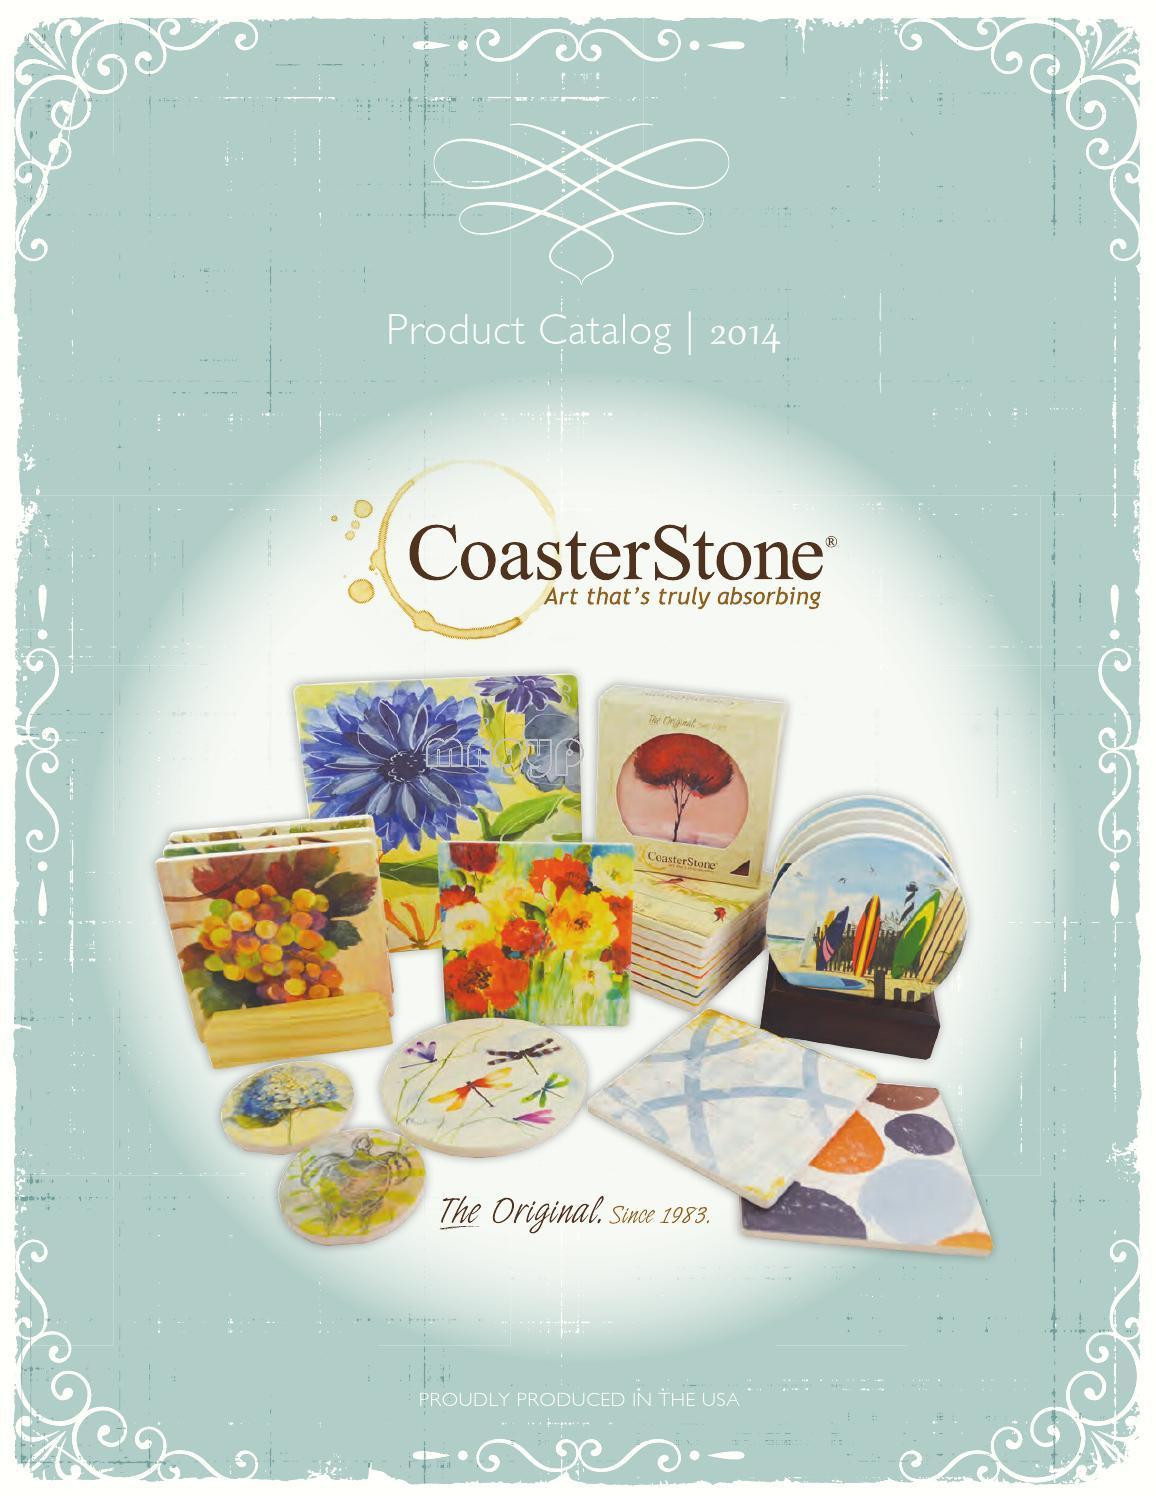 Coasterstone